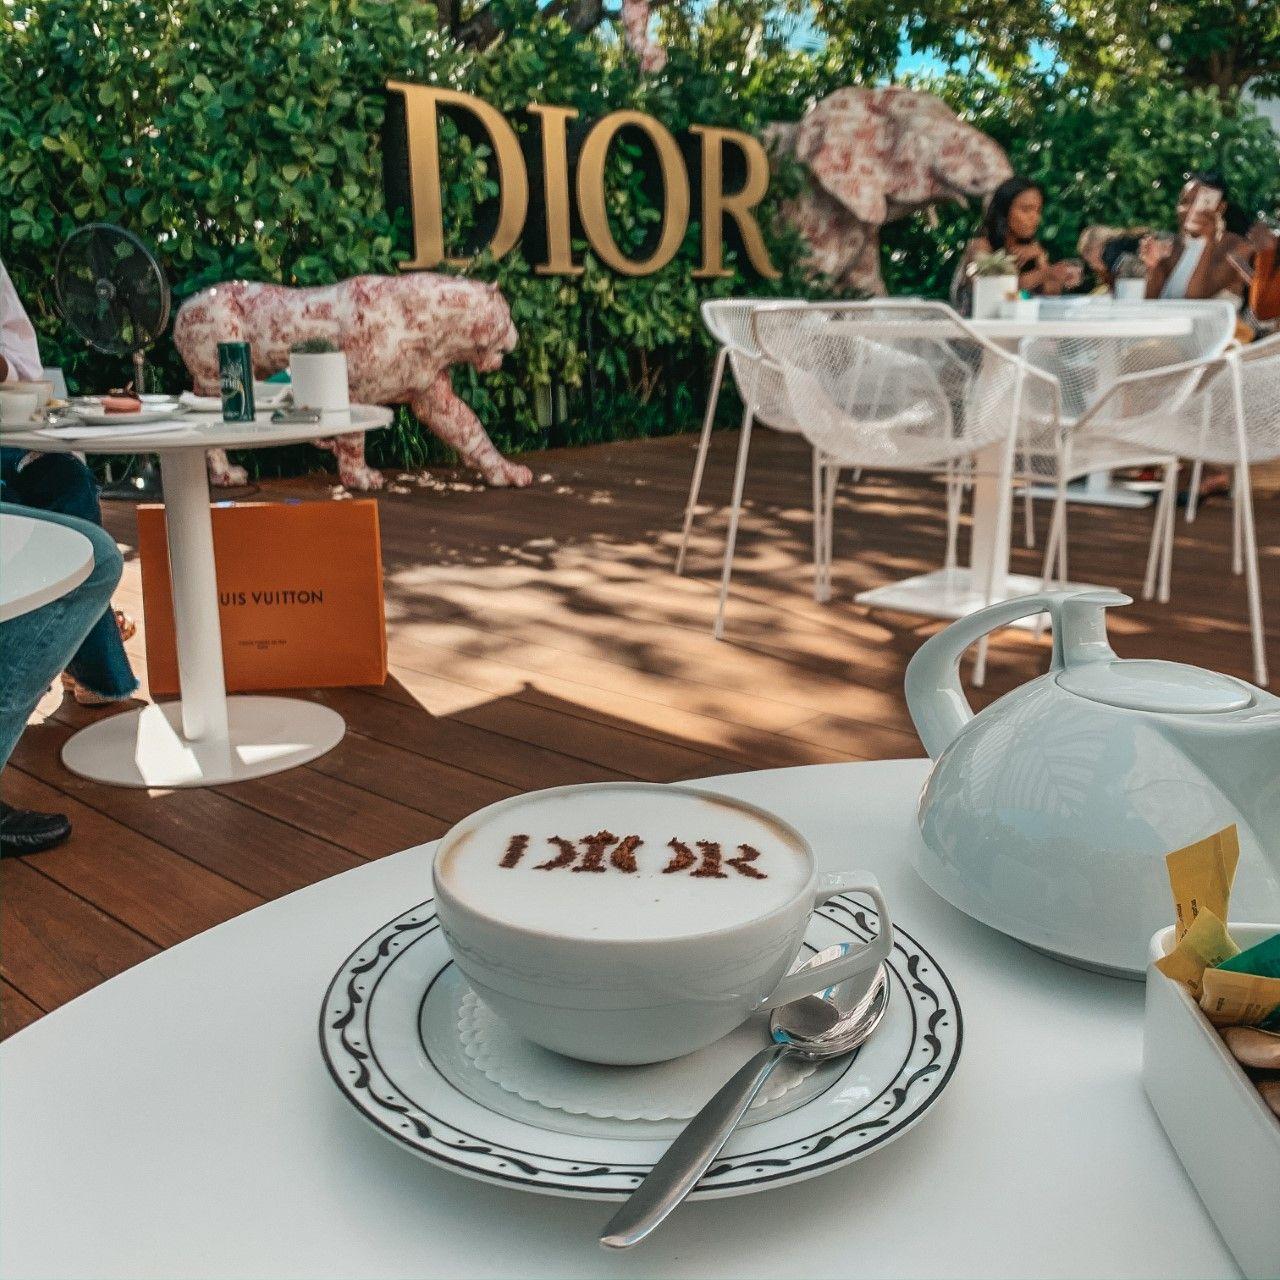 Dior Miami Cafe Luxury Food Miami Restaurants Aesthetic Food